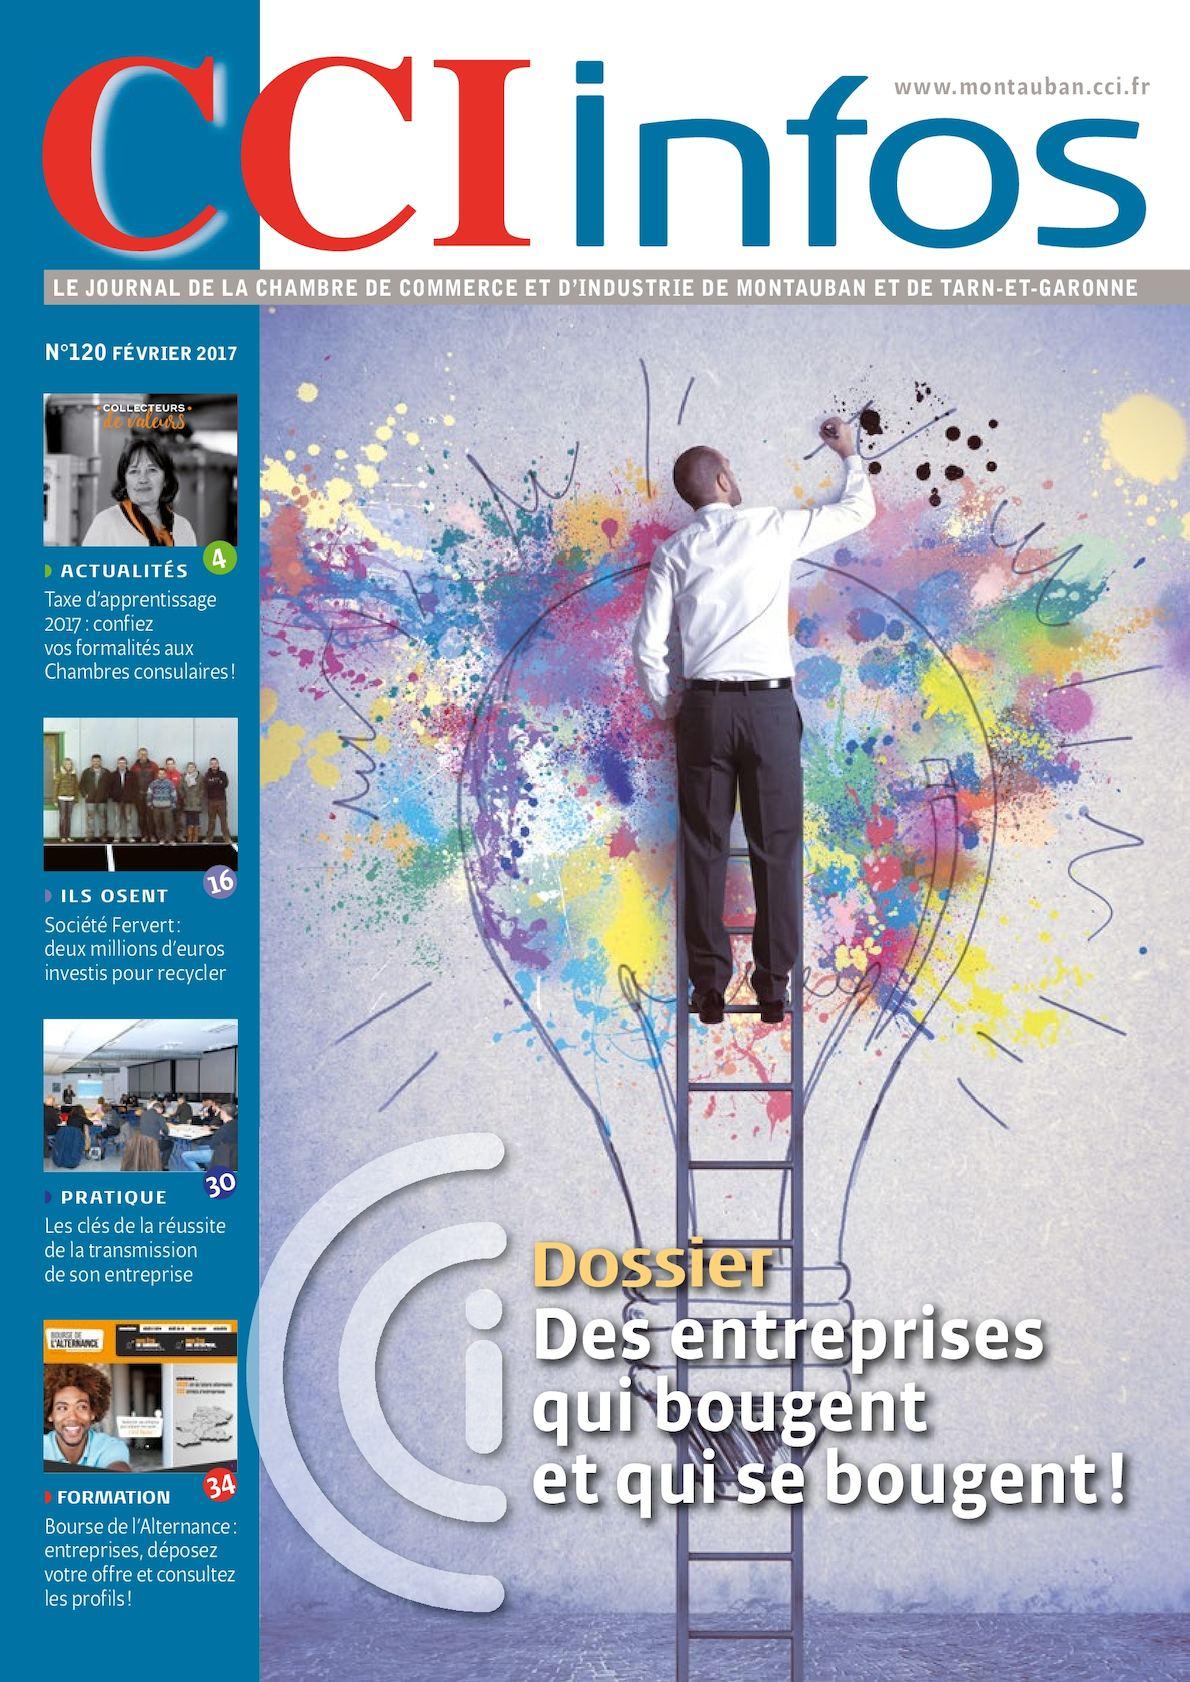 Calam o cci infos janvier 2017 for Chambre de commerce montauban